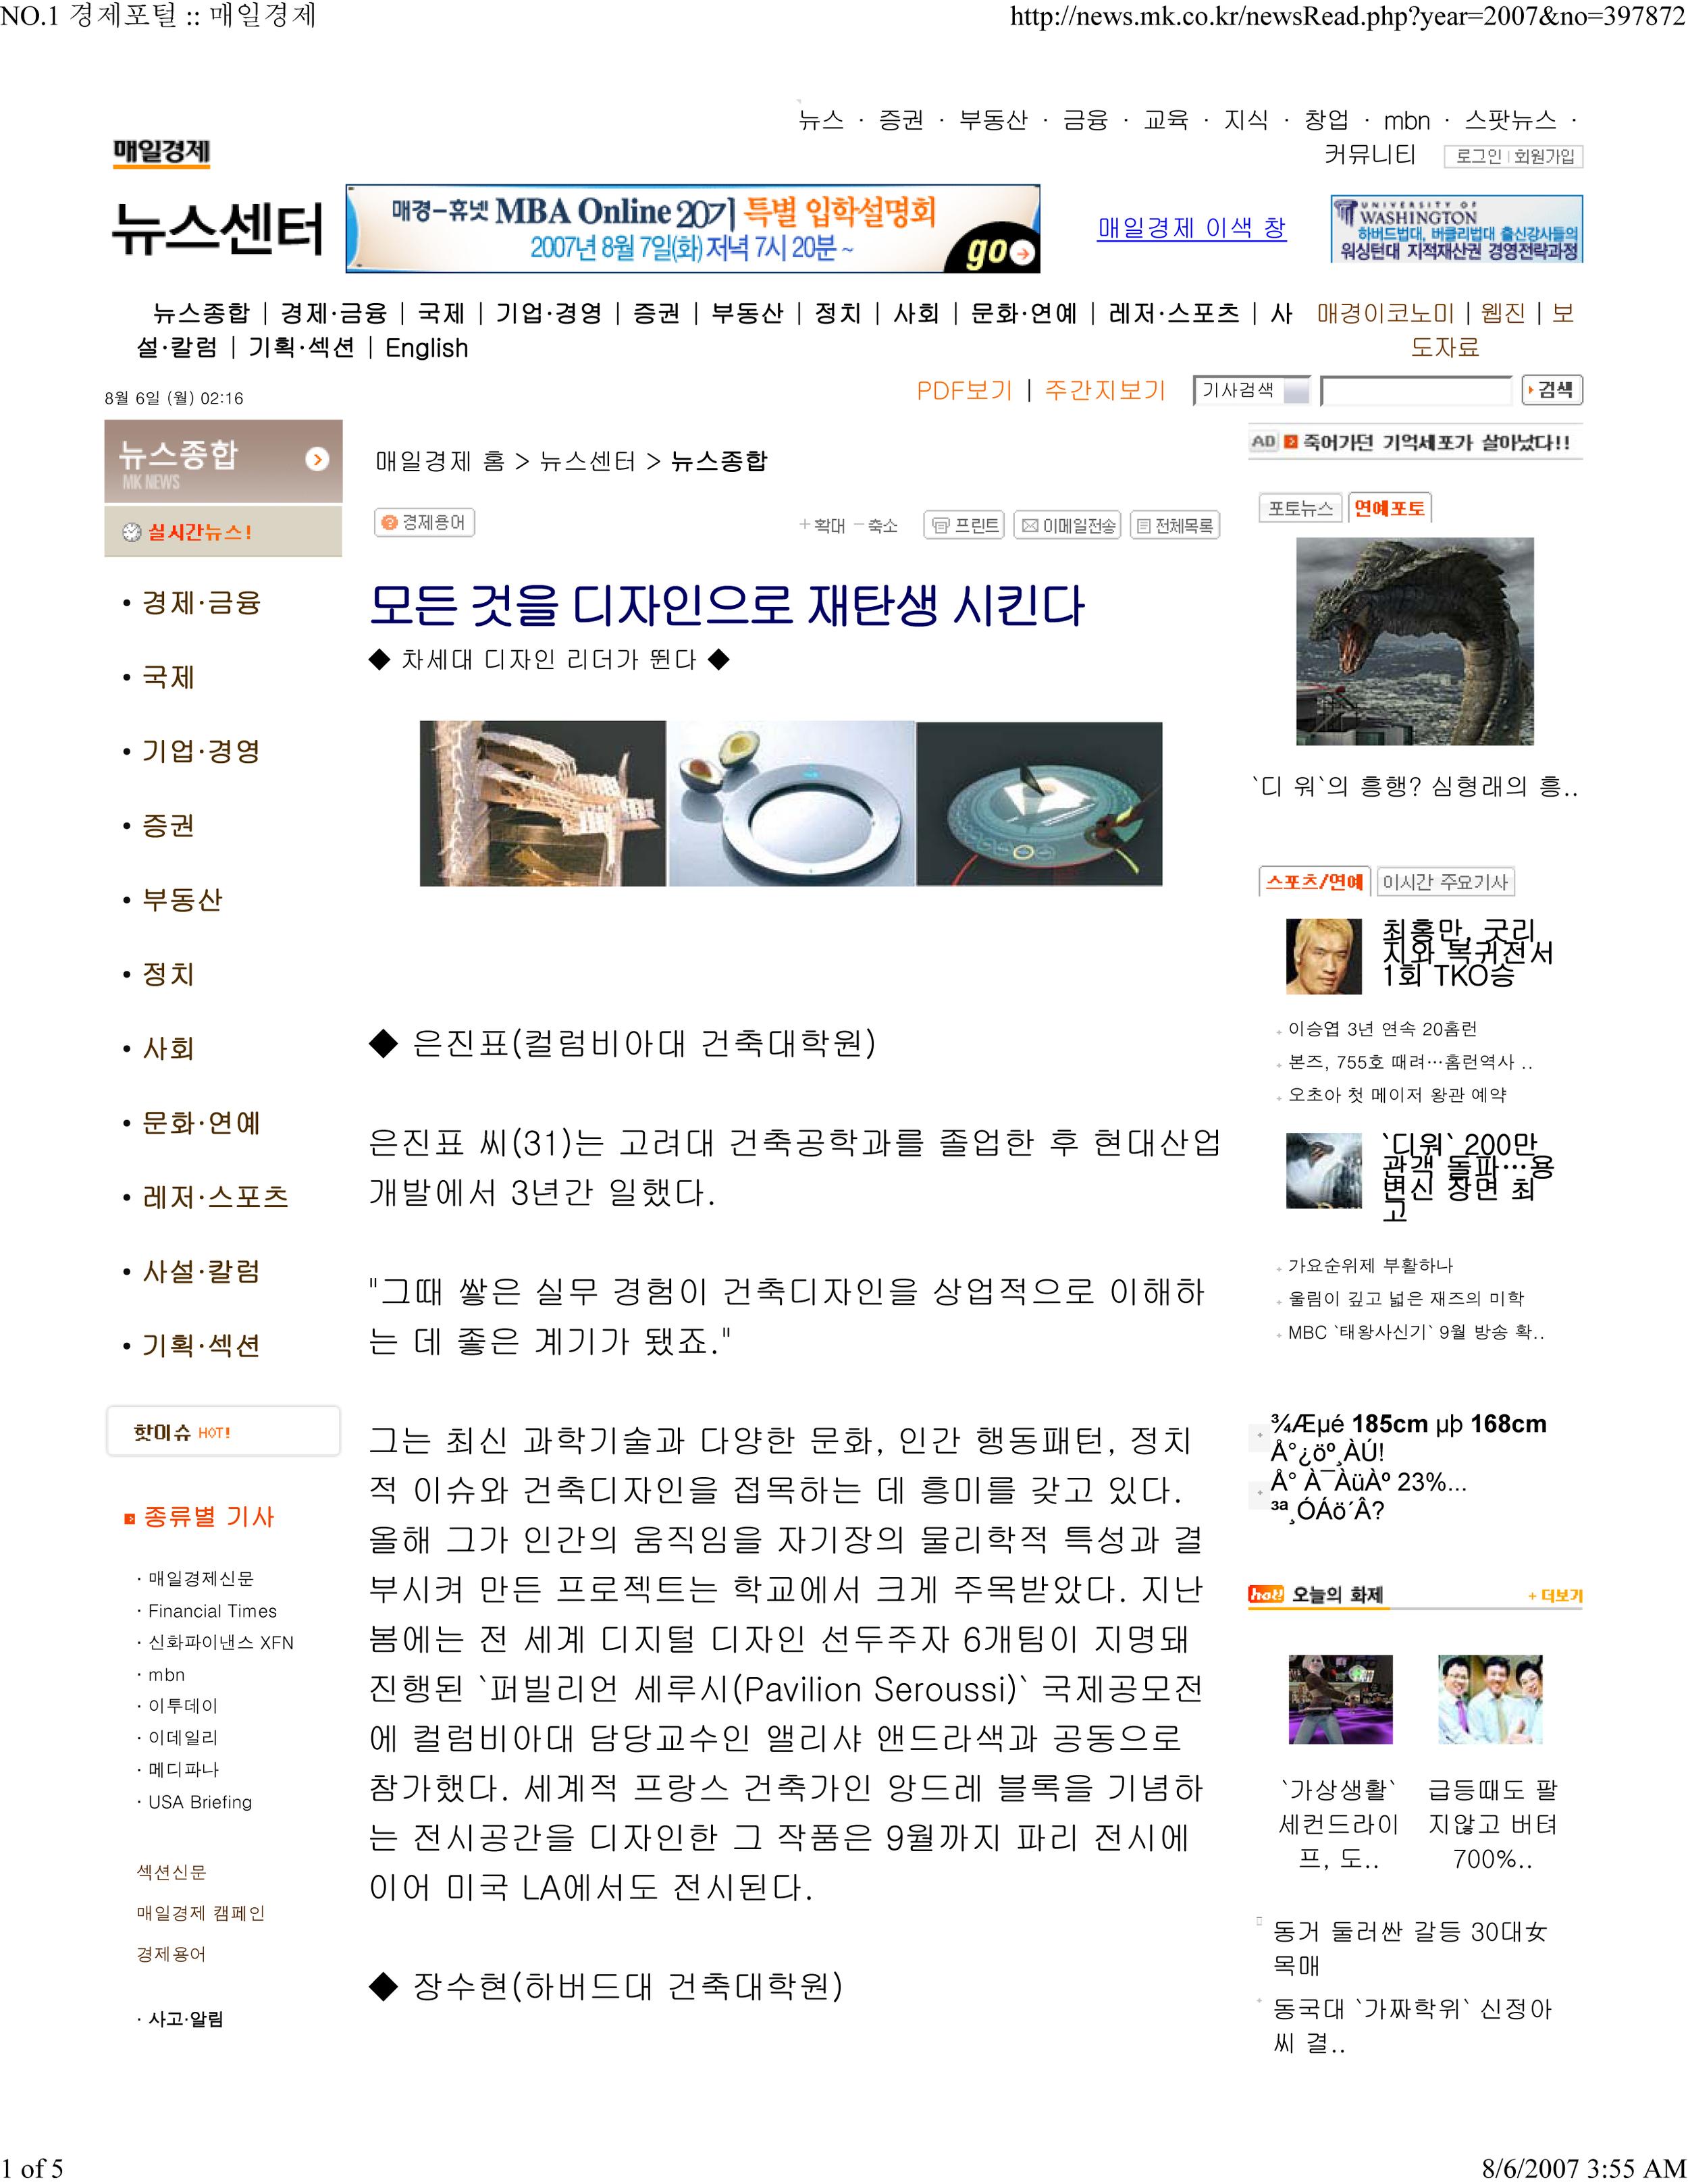 maeil newspaper-1.jpg